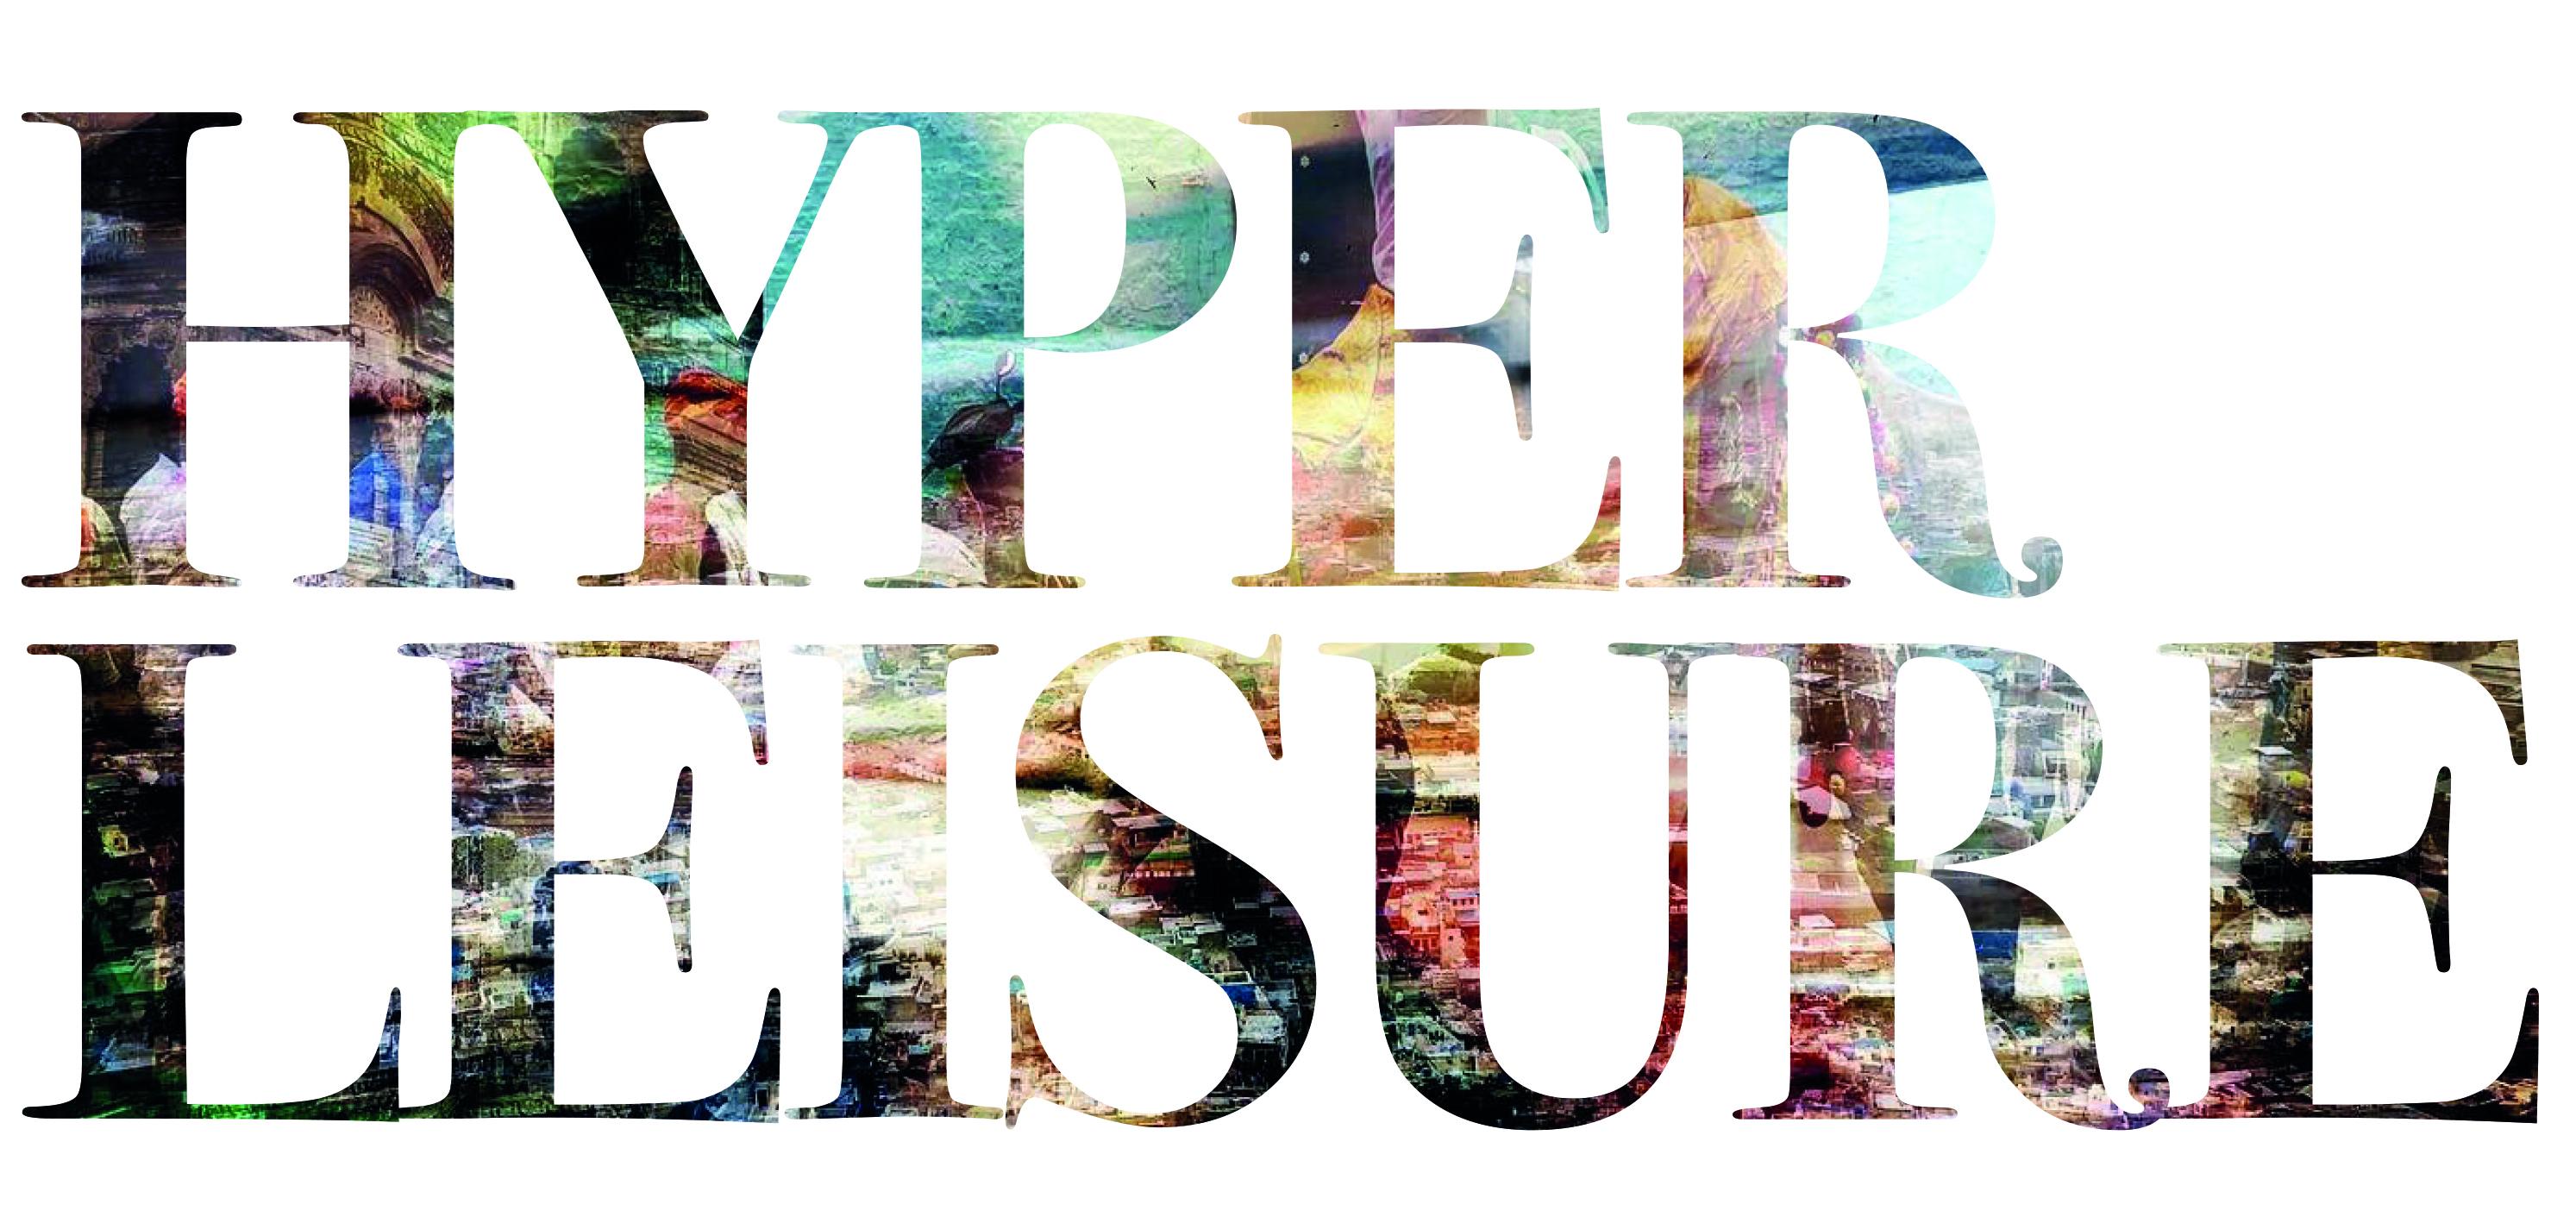 Hyper Leisure